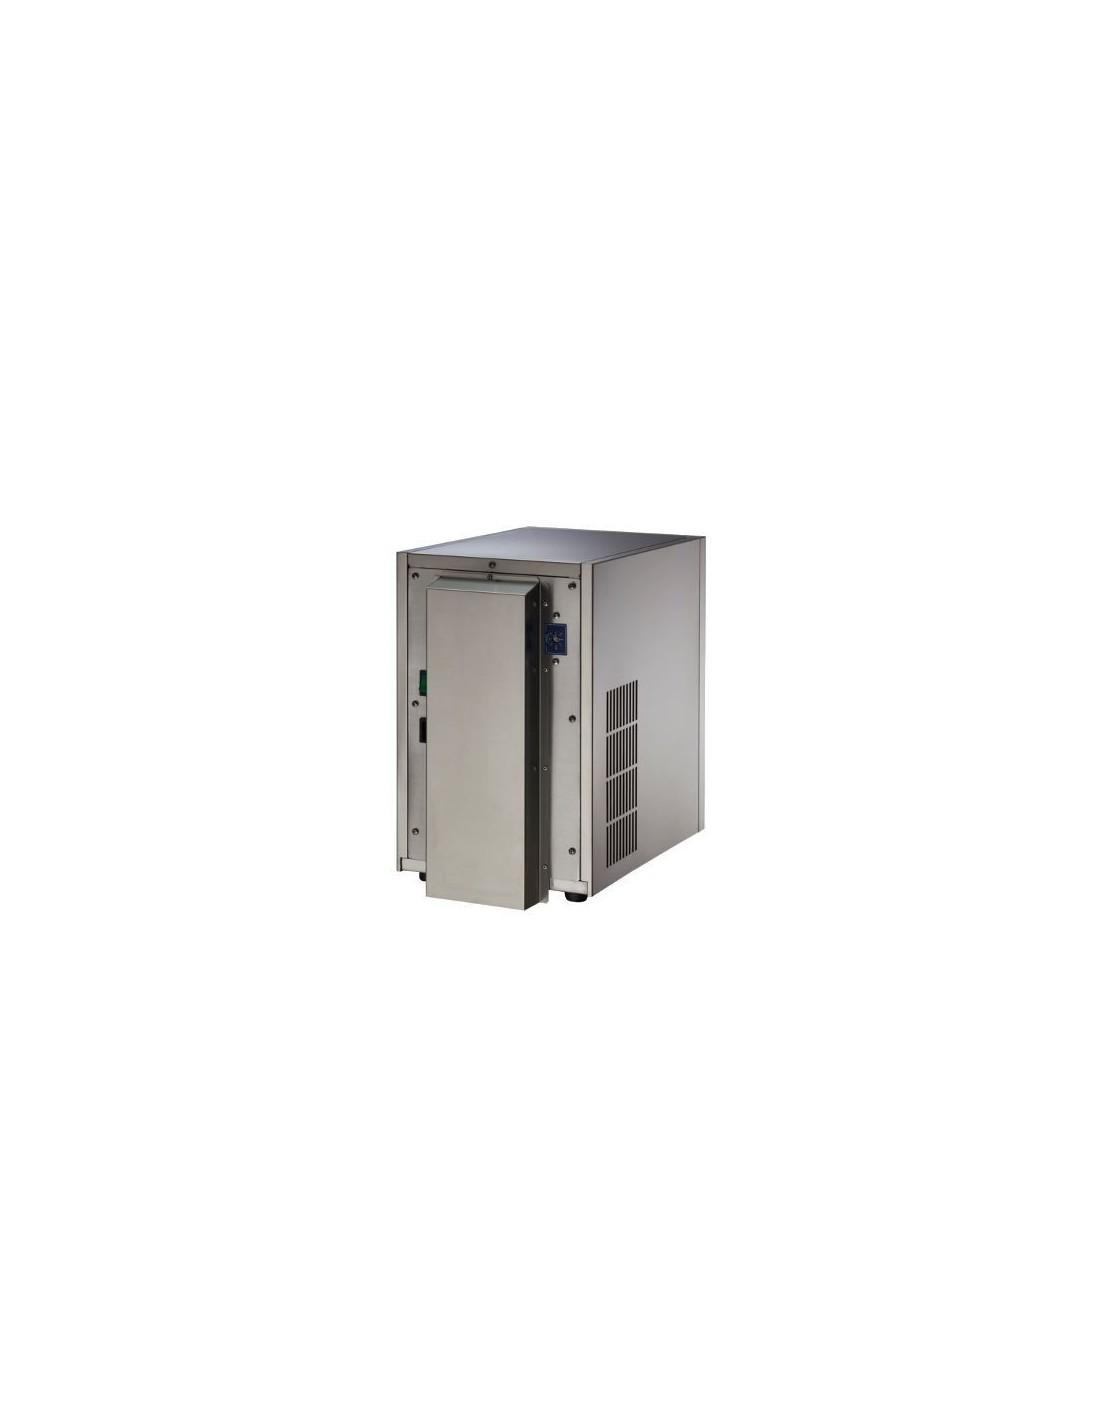 UPP00110 - Kolsyrat vatten - Blupura Blusoda Box Fizz 30